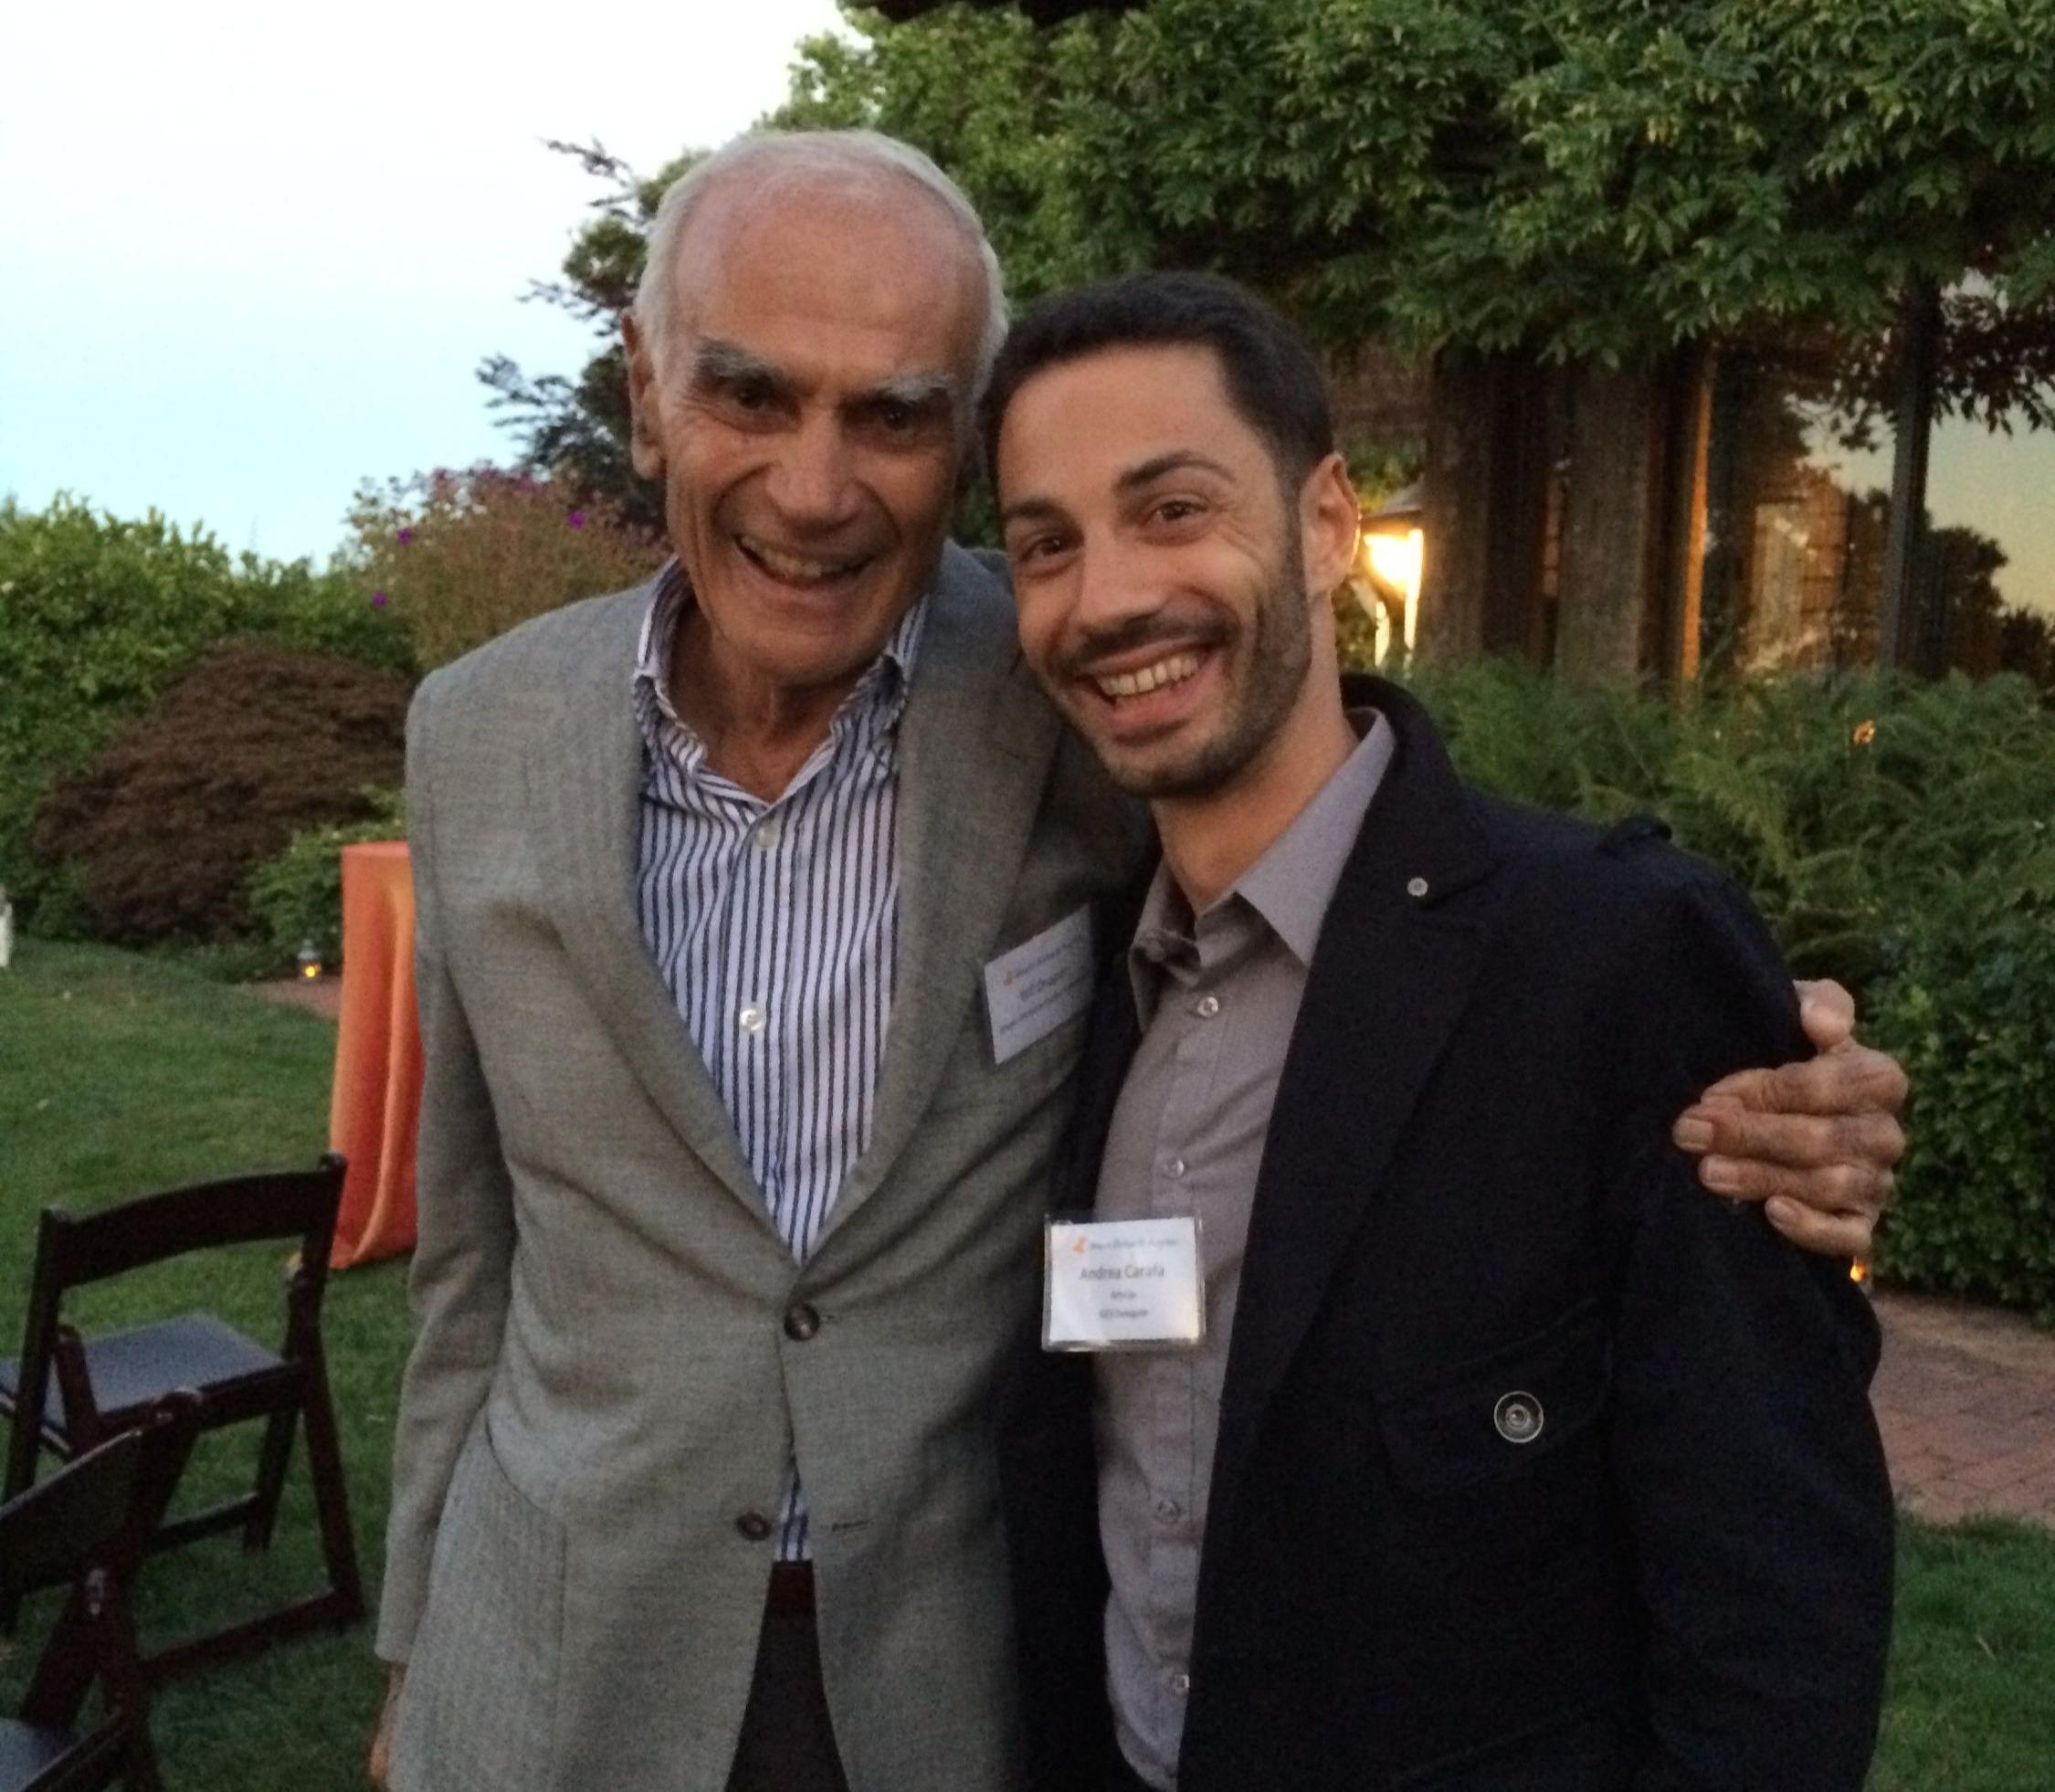 Andrea Carafa and Bill Draper at the Global Entrepreneurship Summit